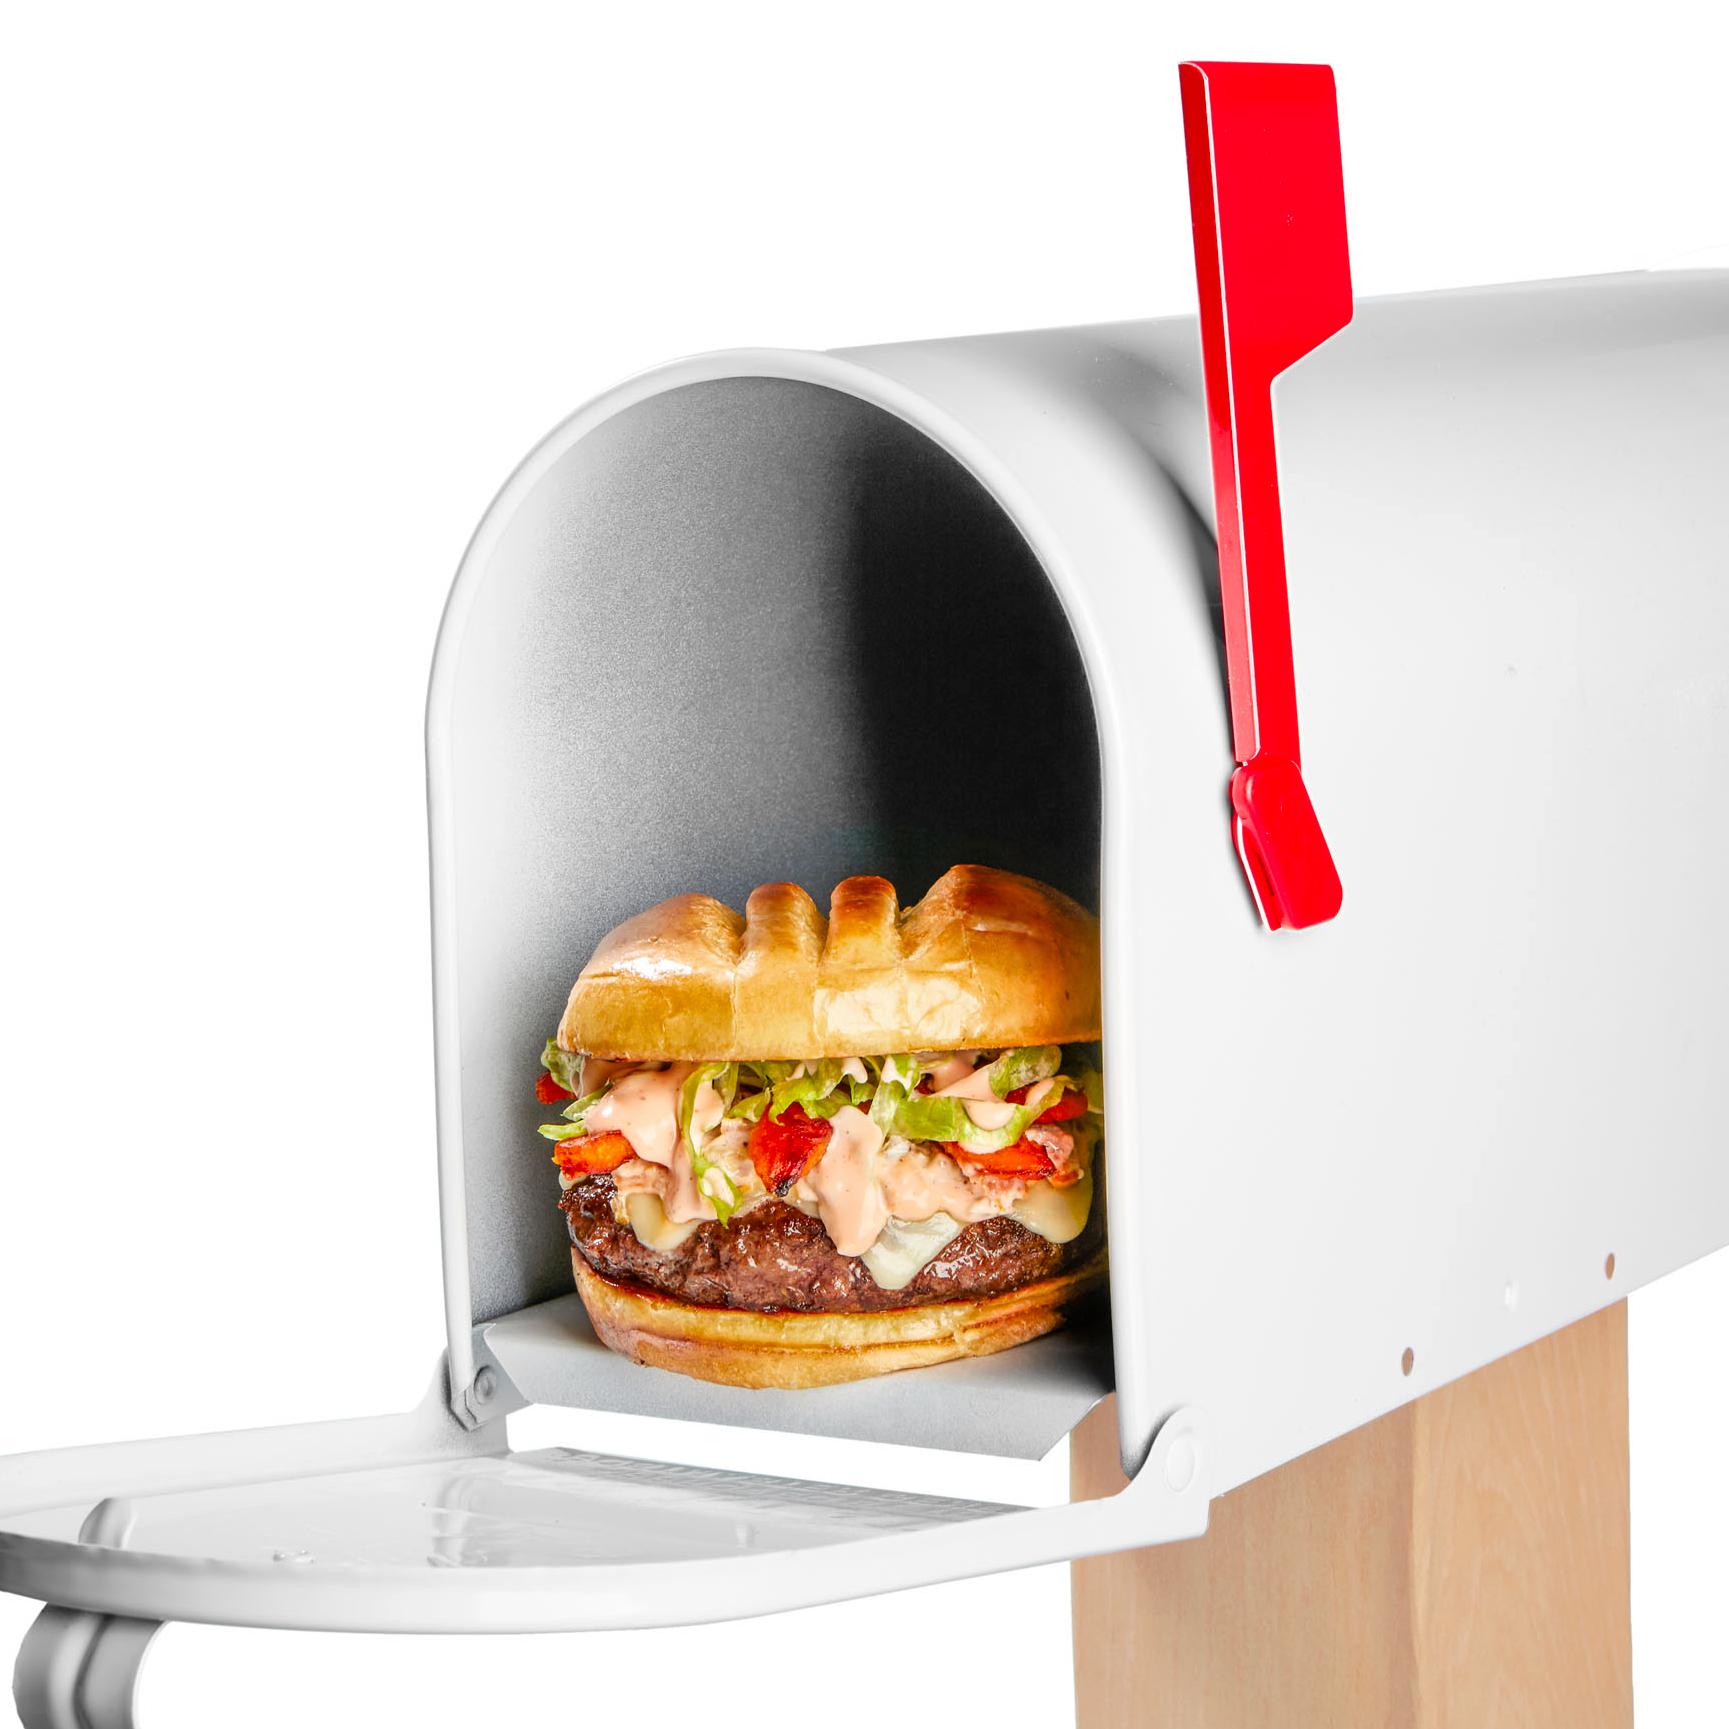 Burger in mailbox